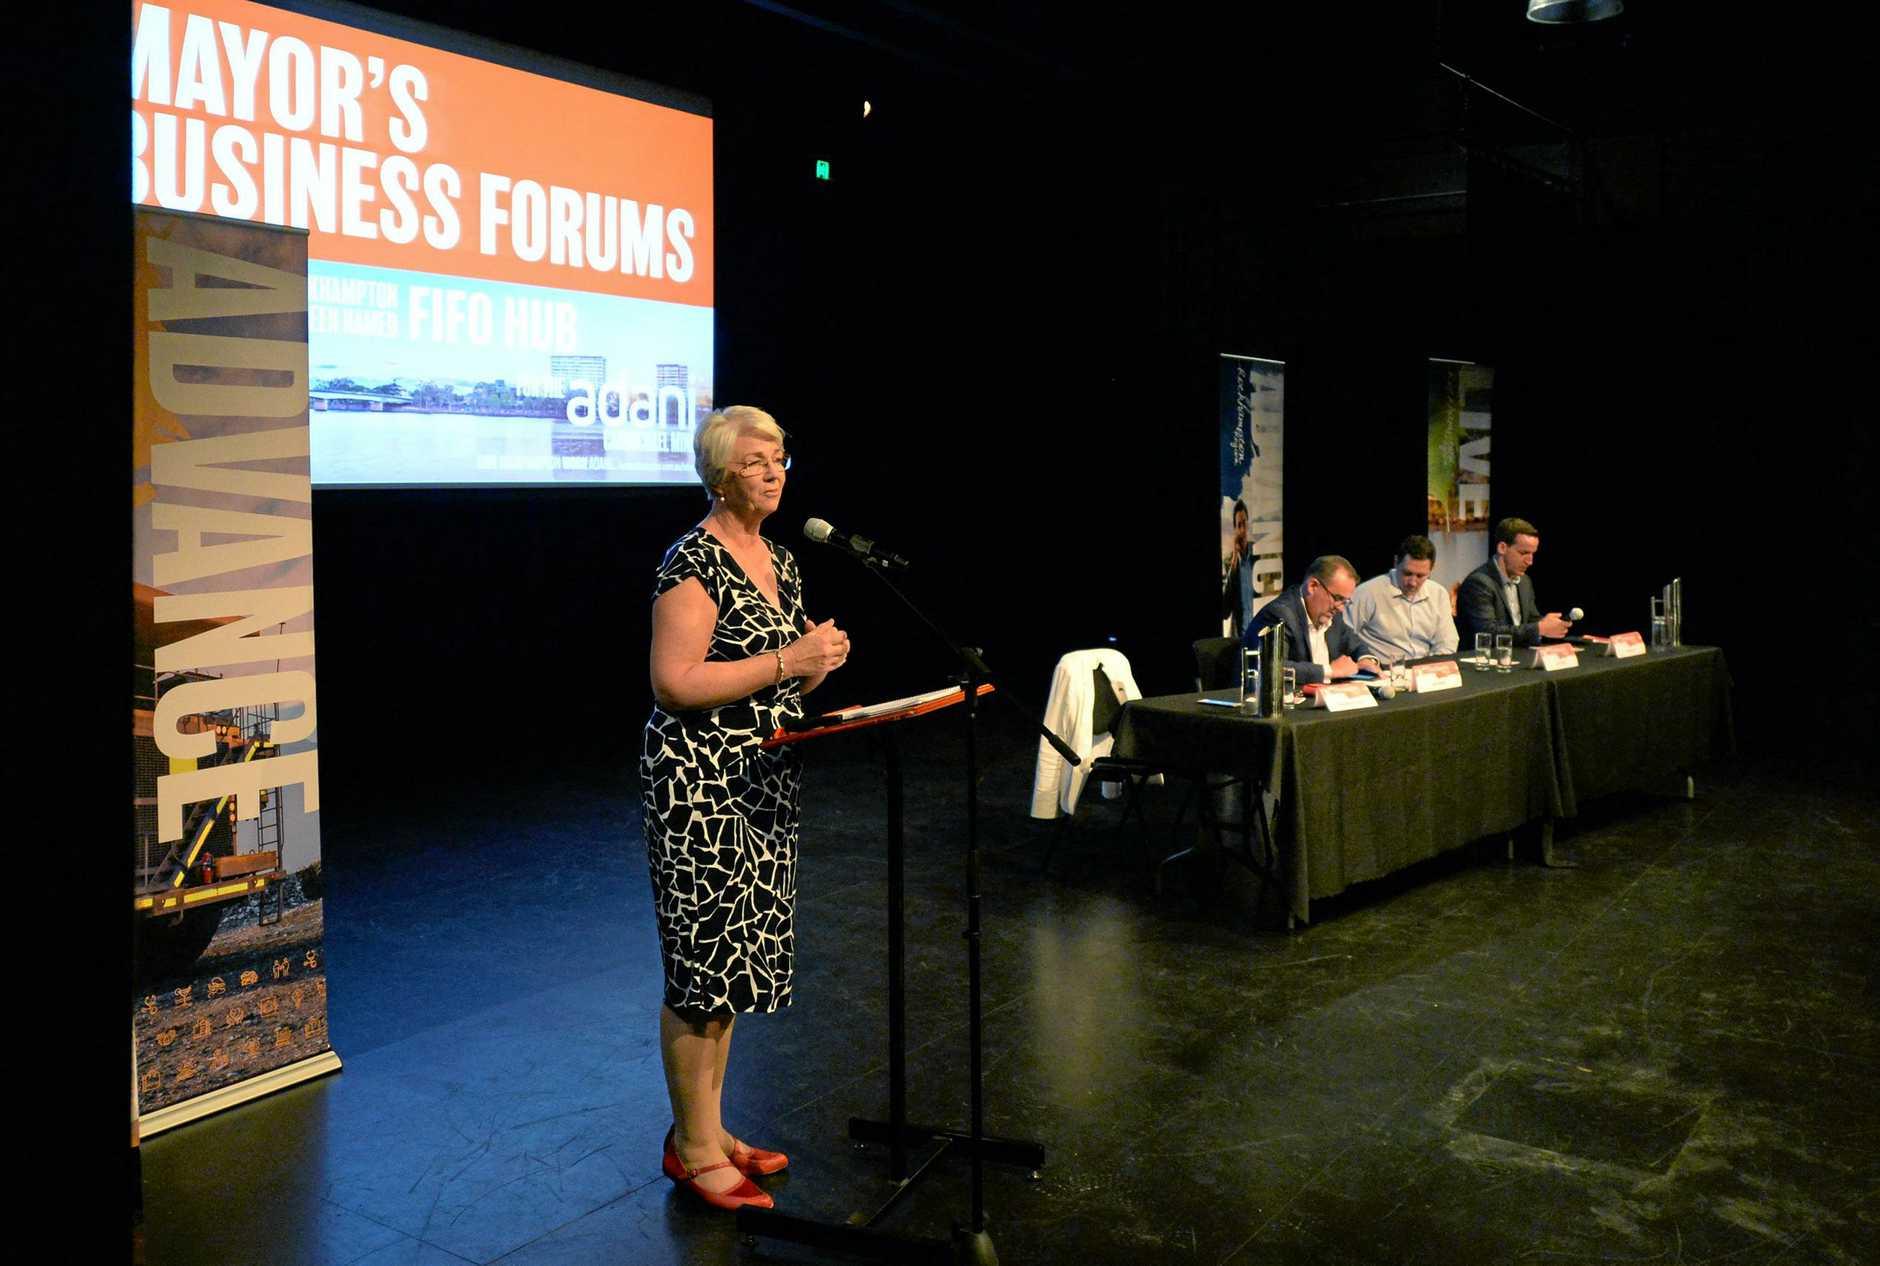 Mayor Margaret Strelow addresses the Business Forum on the Adani mine development.